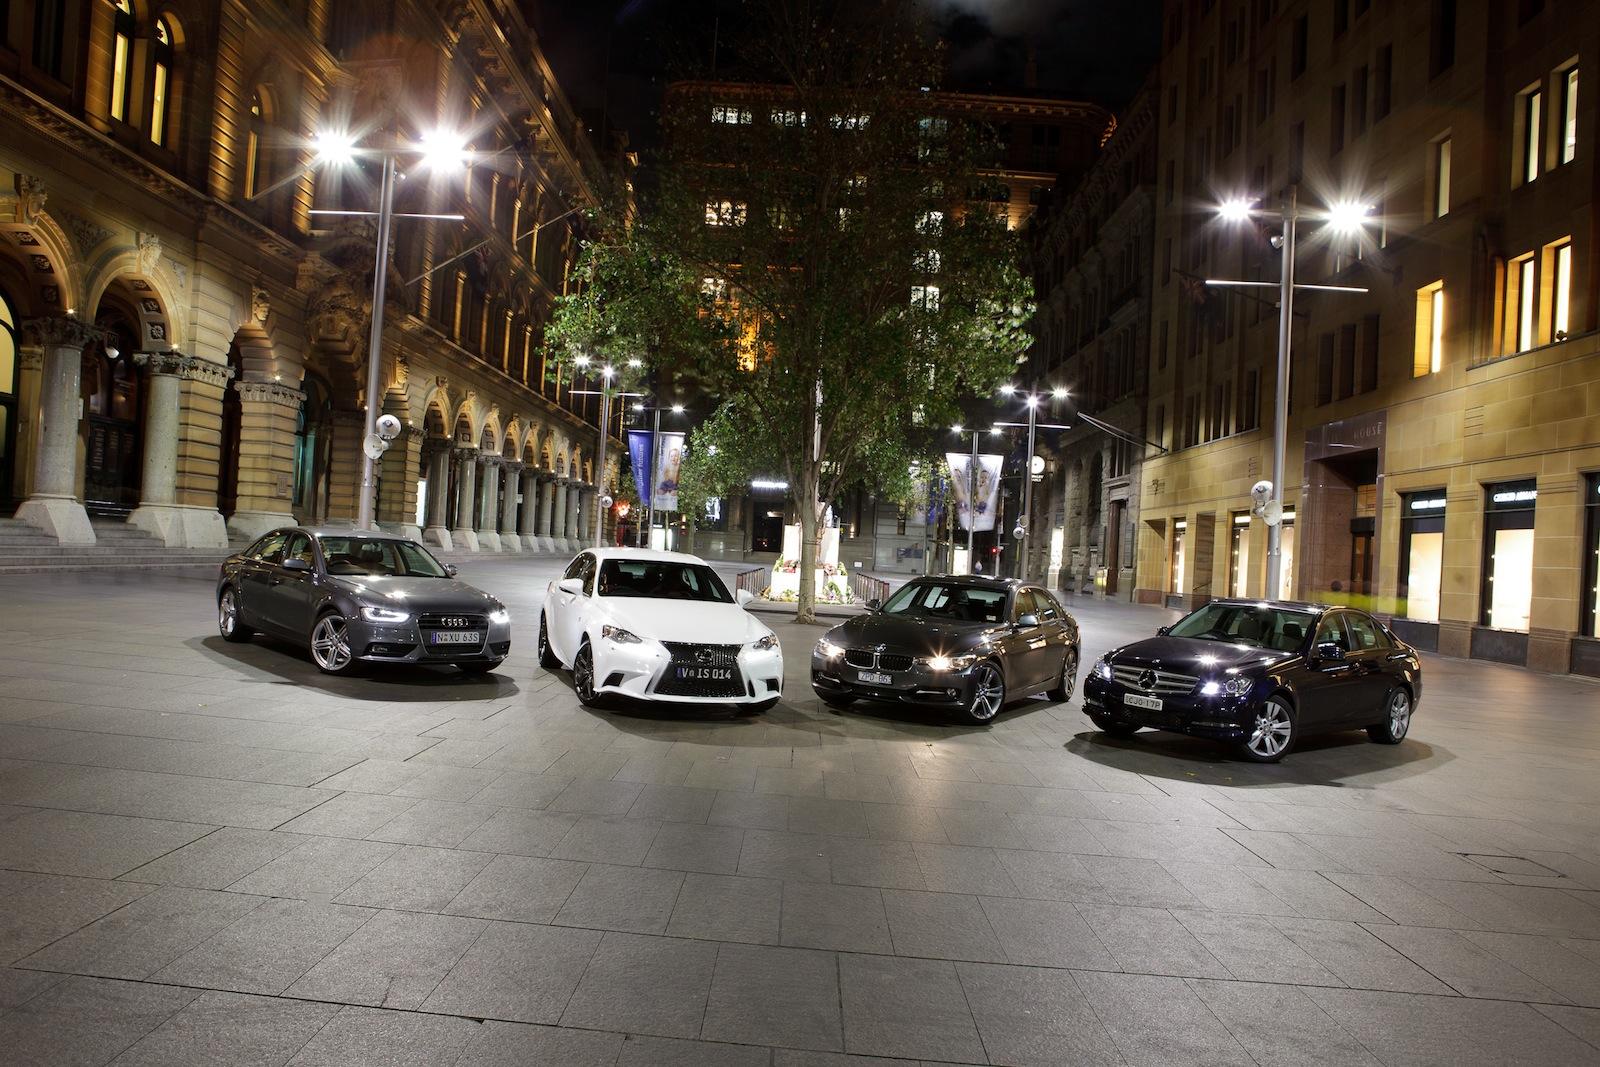 2013 BMW 320i vs Audi A4 vs Mercedes-Benz C200 vs Lexus IS 250 Comparison - autoevolution